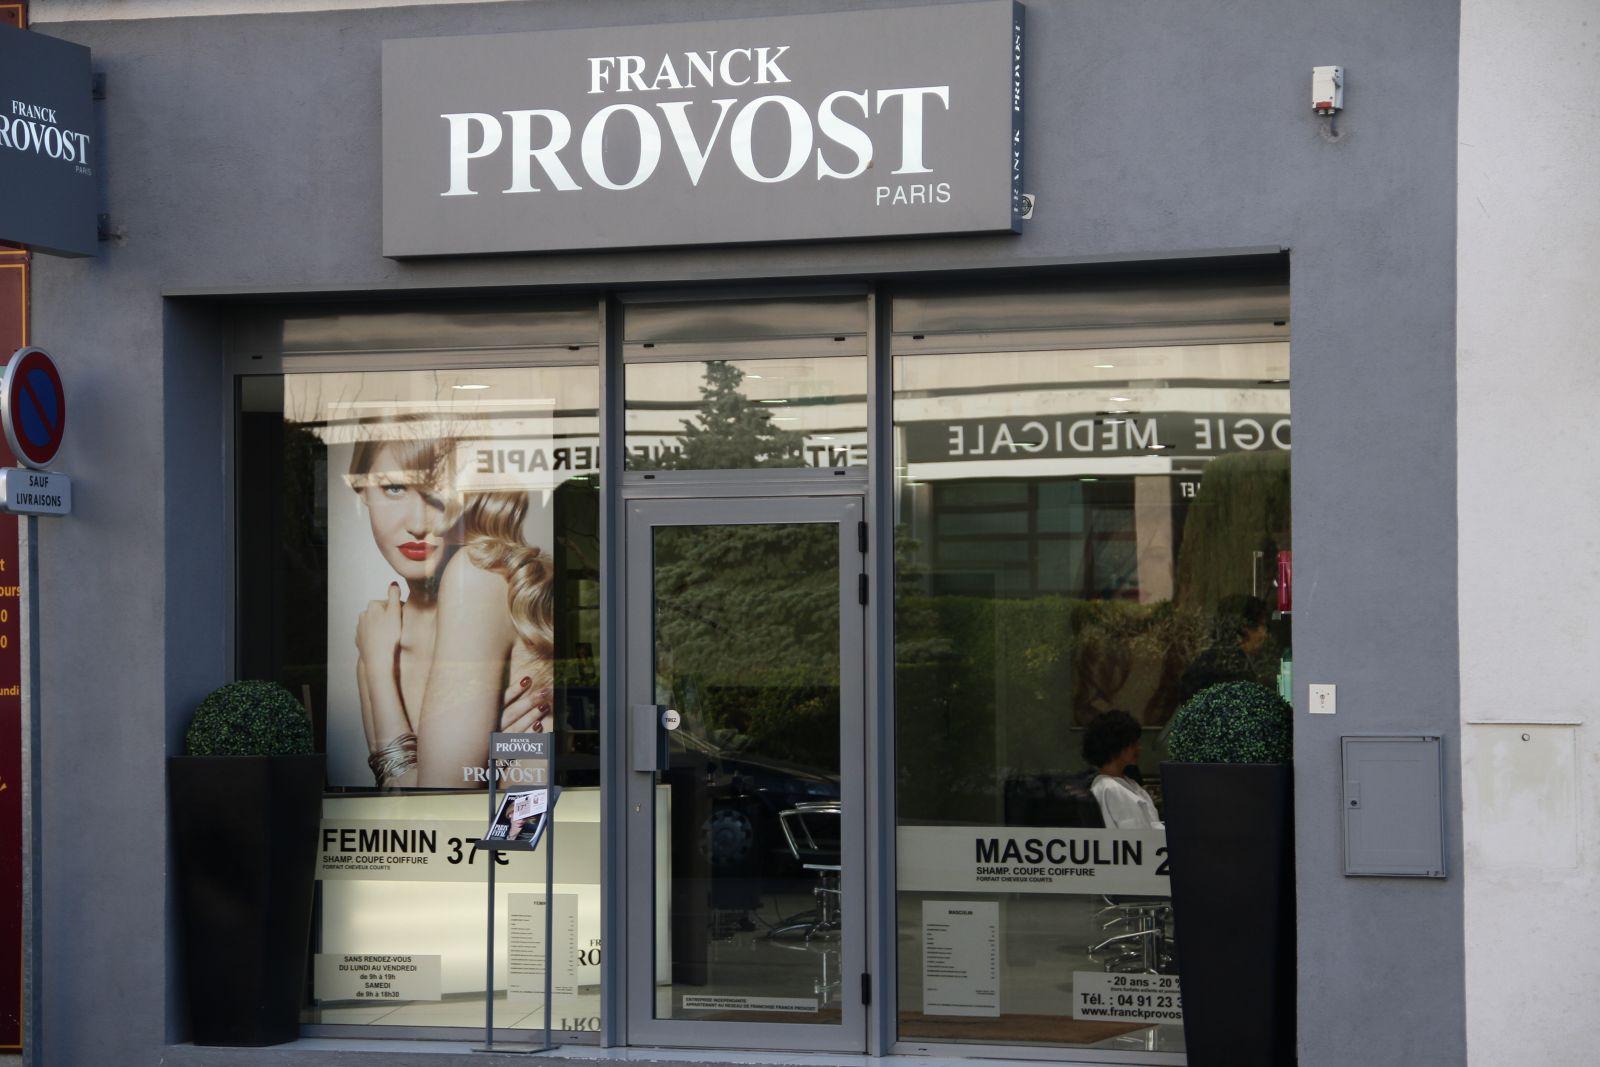 Franck provost marseille avis tarifs horaires t l phone for Tarif salon franck provost